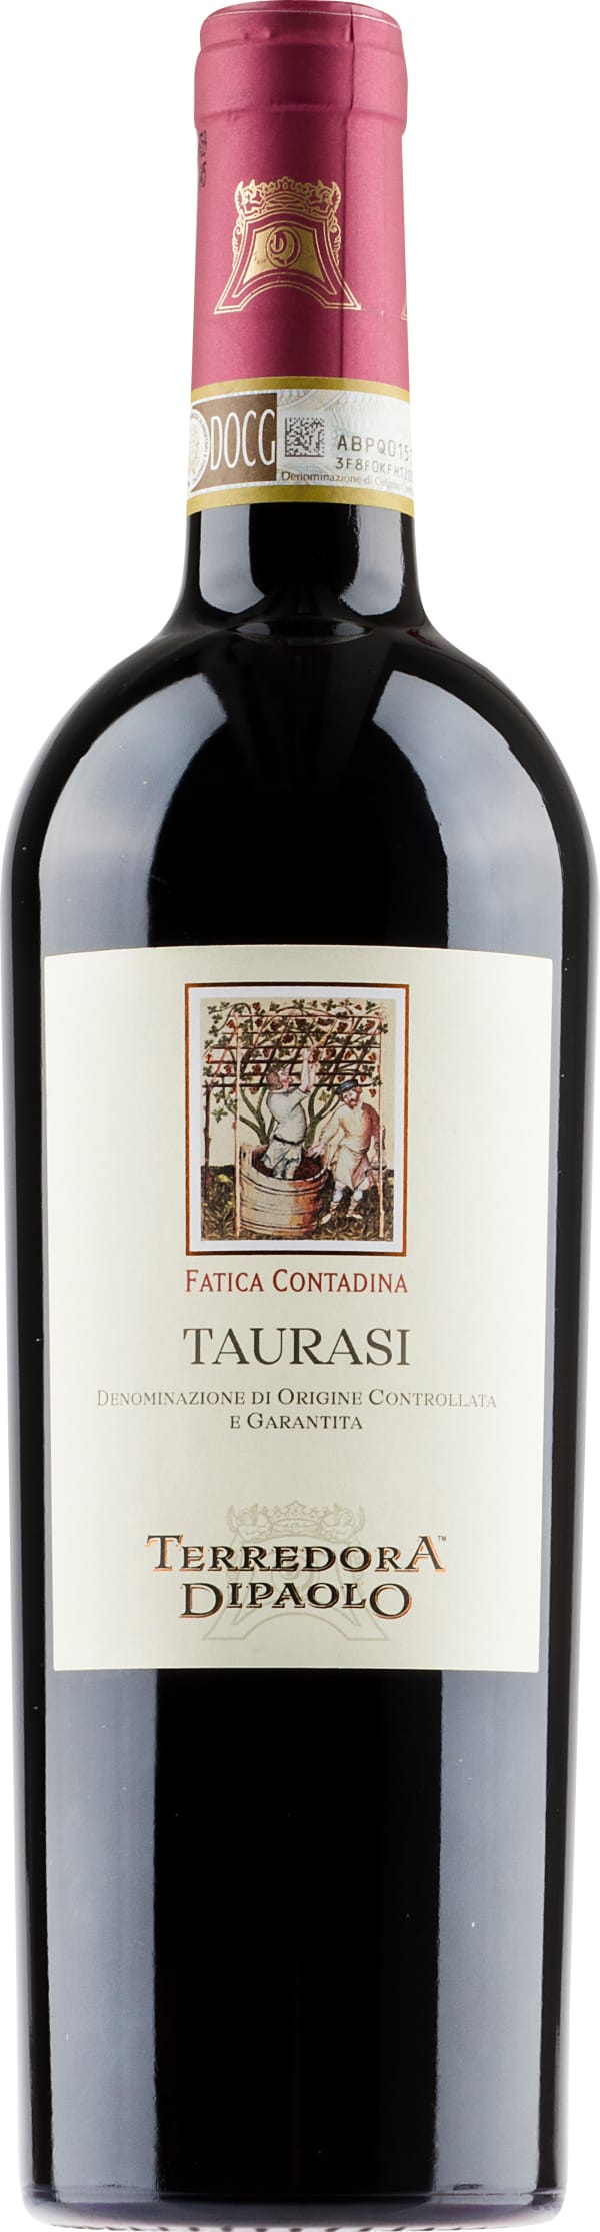 Terredora di Paolo Fatica Contadina Taurasi 2014